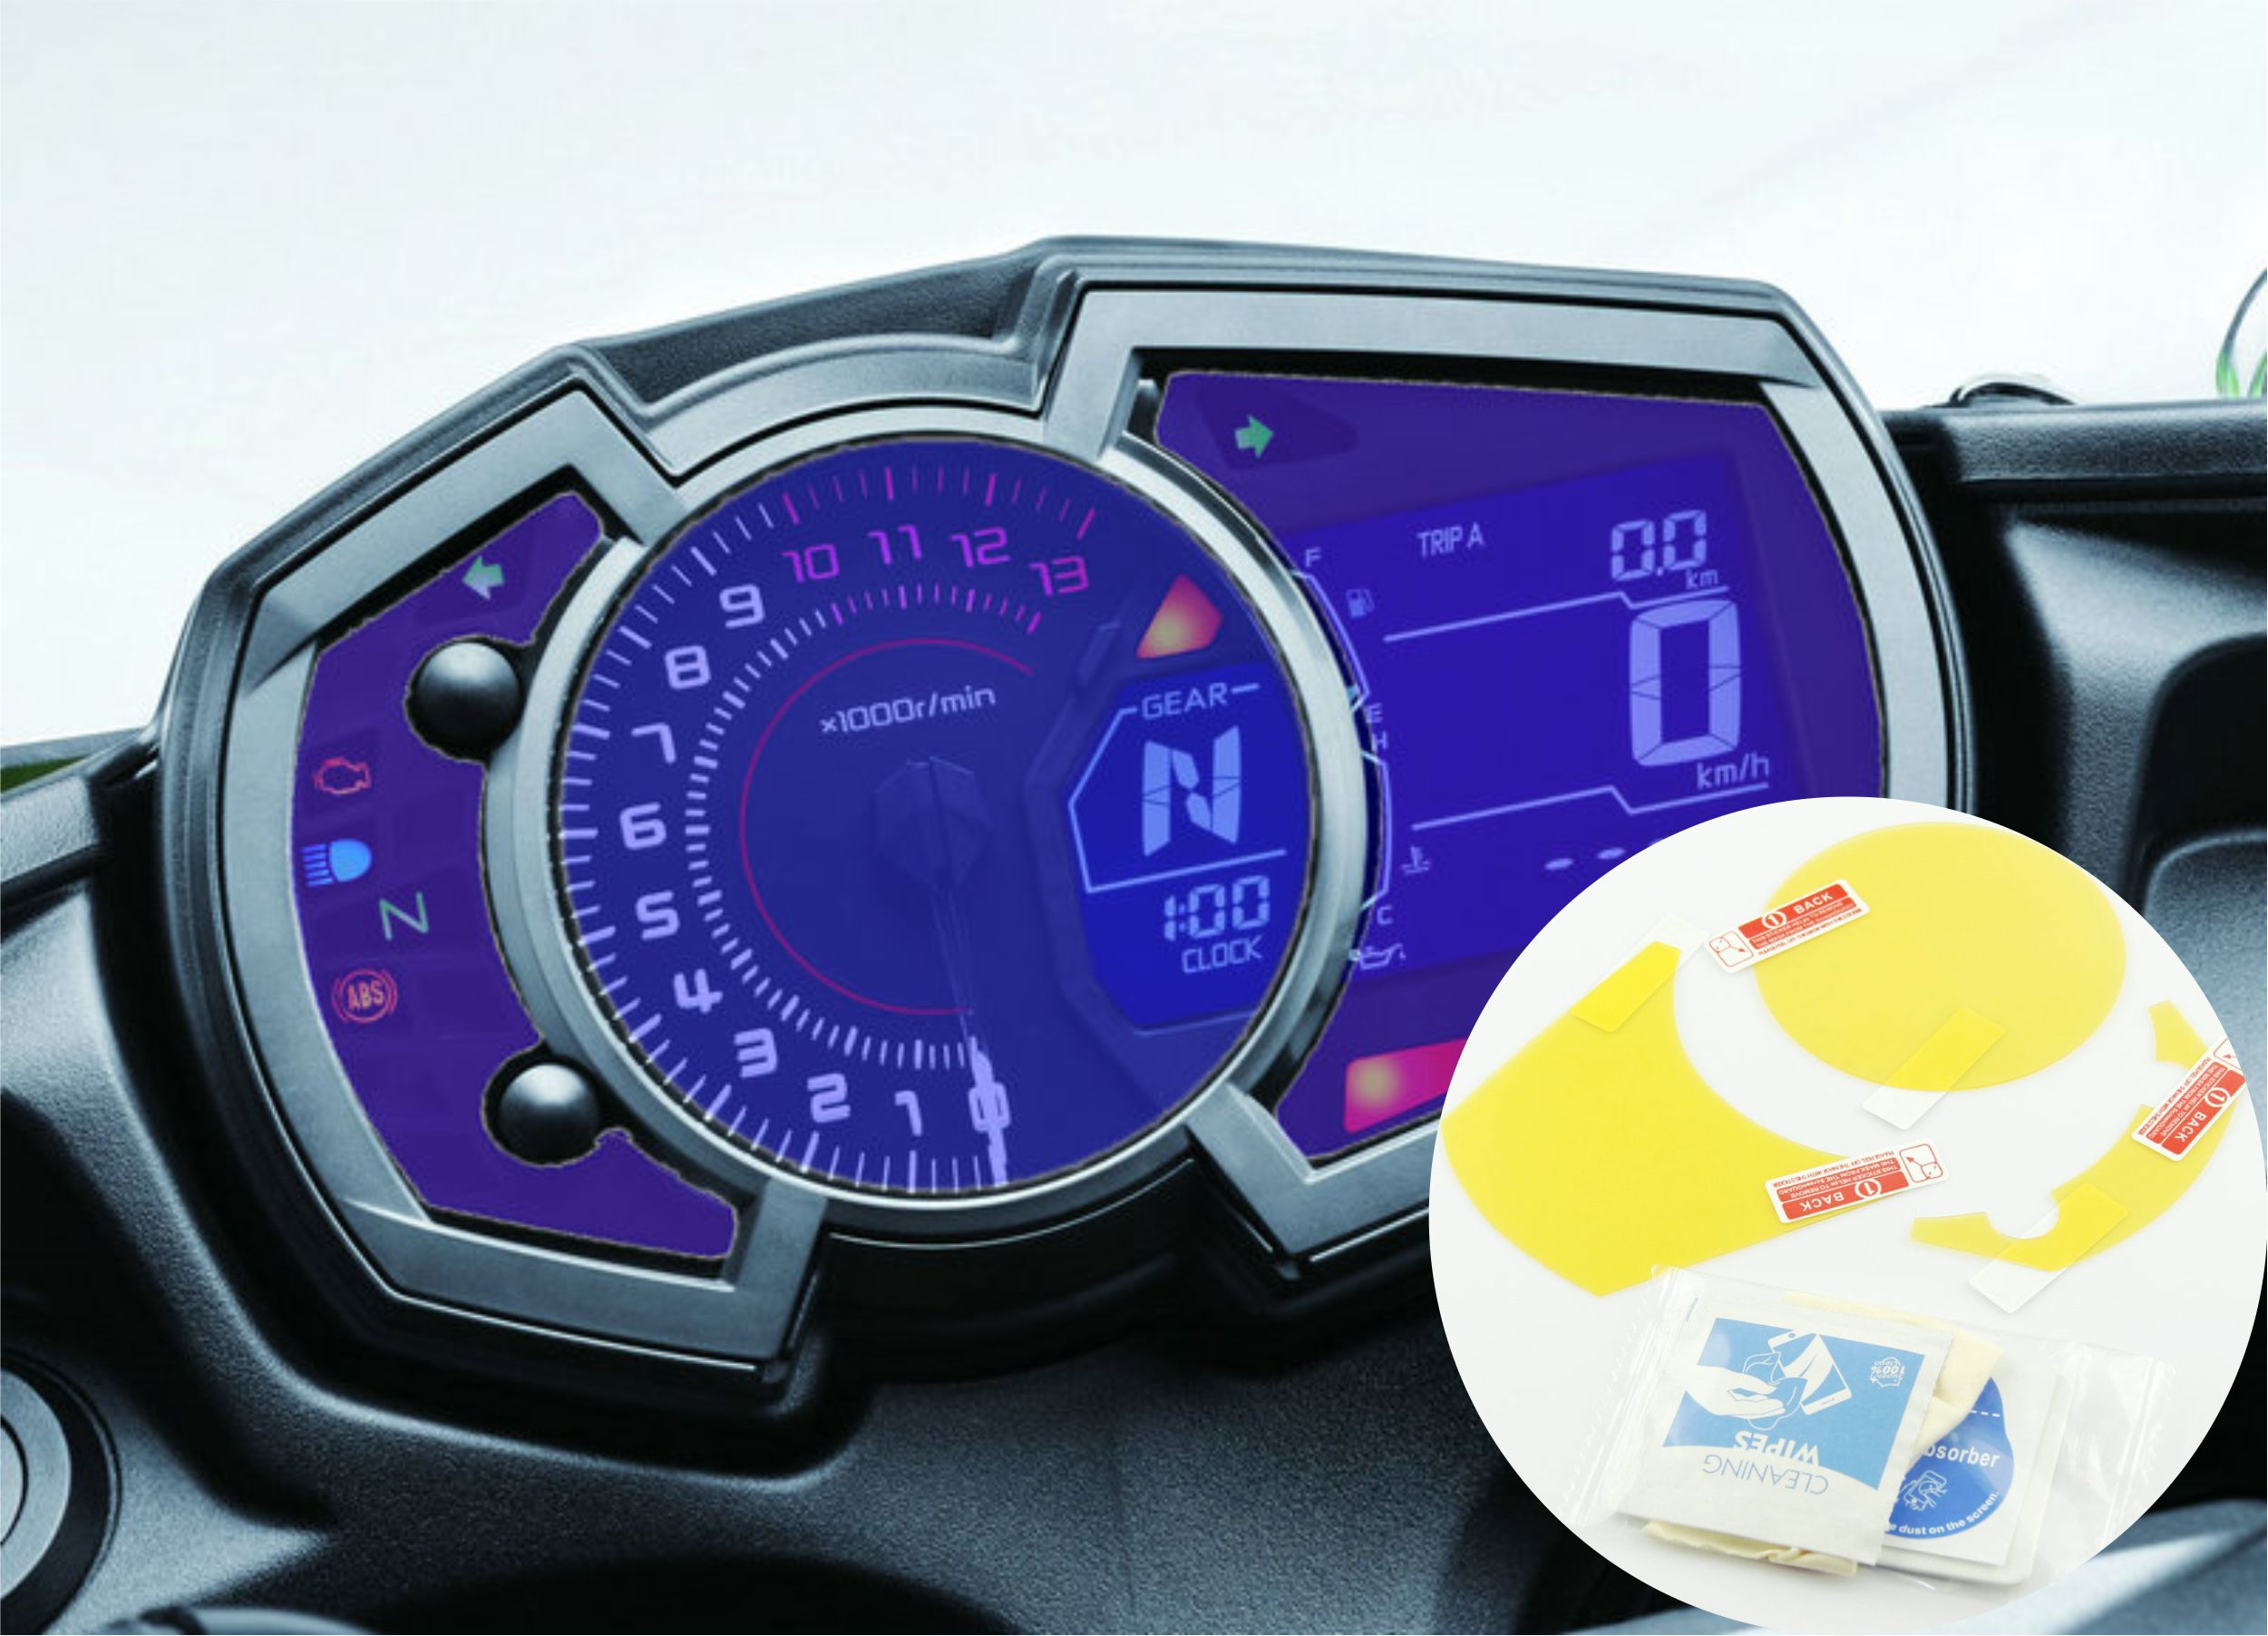 Cluster Scratch Protection Film Screen Protector For Kawasaki Ninja650 Ninja1000 Versys-X300 2017 Ninja400 Ninja250 Z1000SX